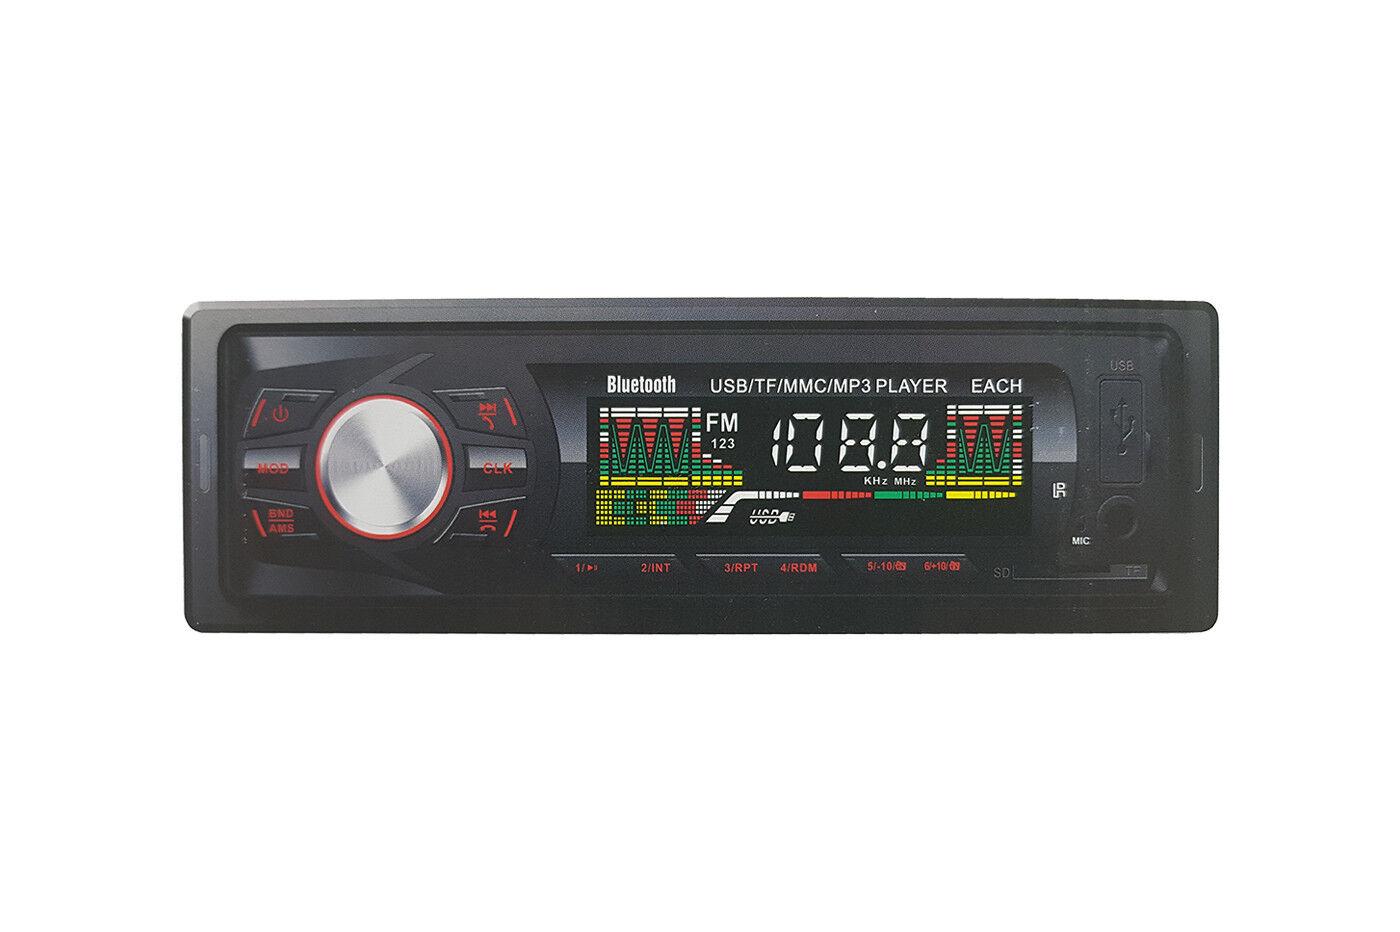 autoradio: Autoradio stereo radio fm bluetooth mp3 usb aux telecomando auto EACH-5008BT